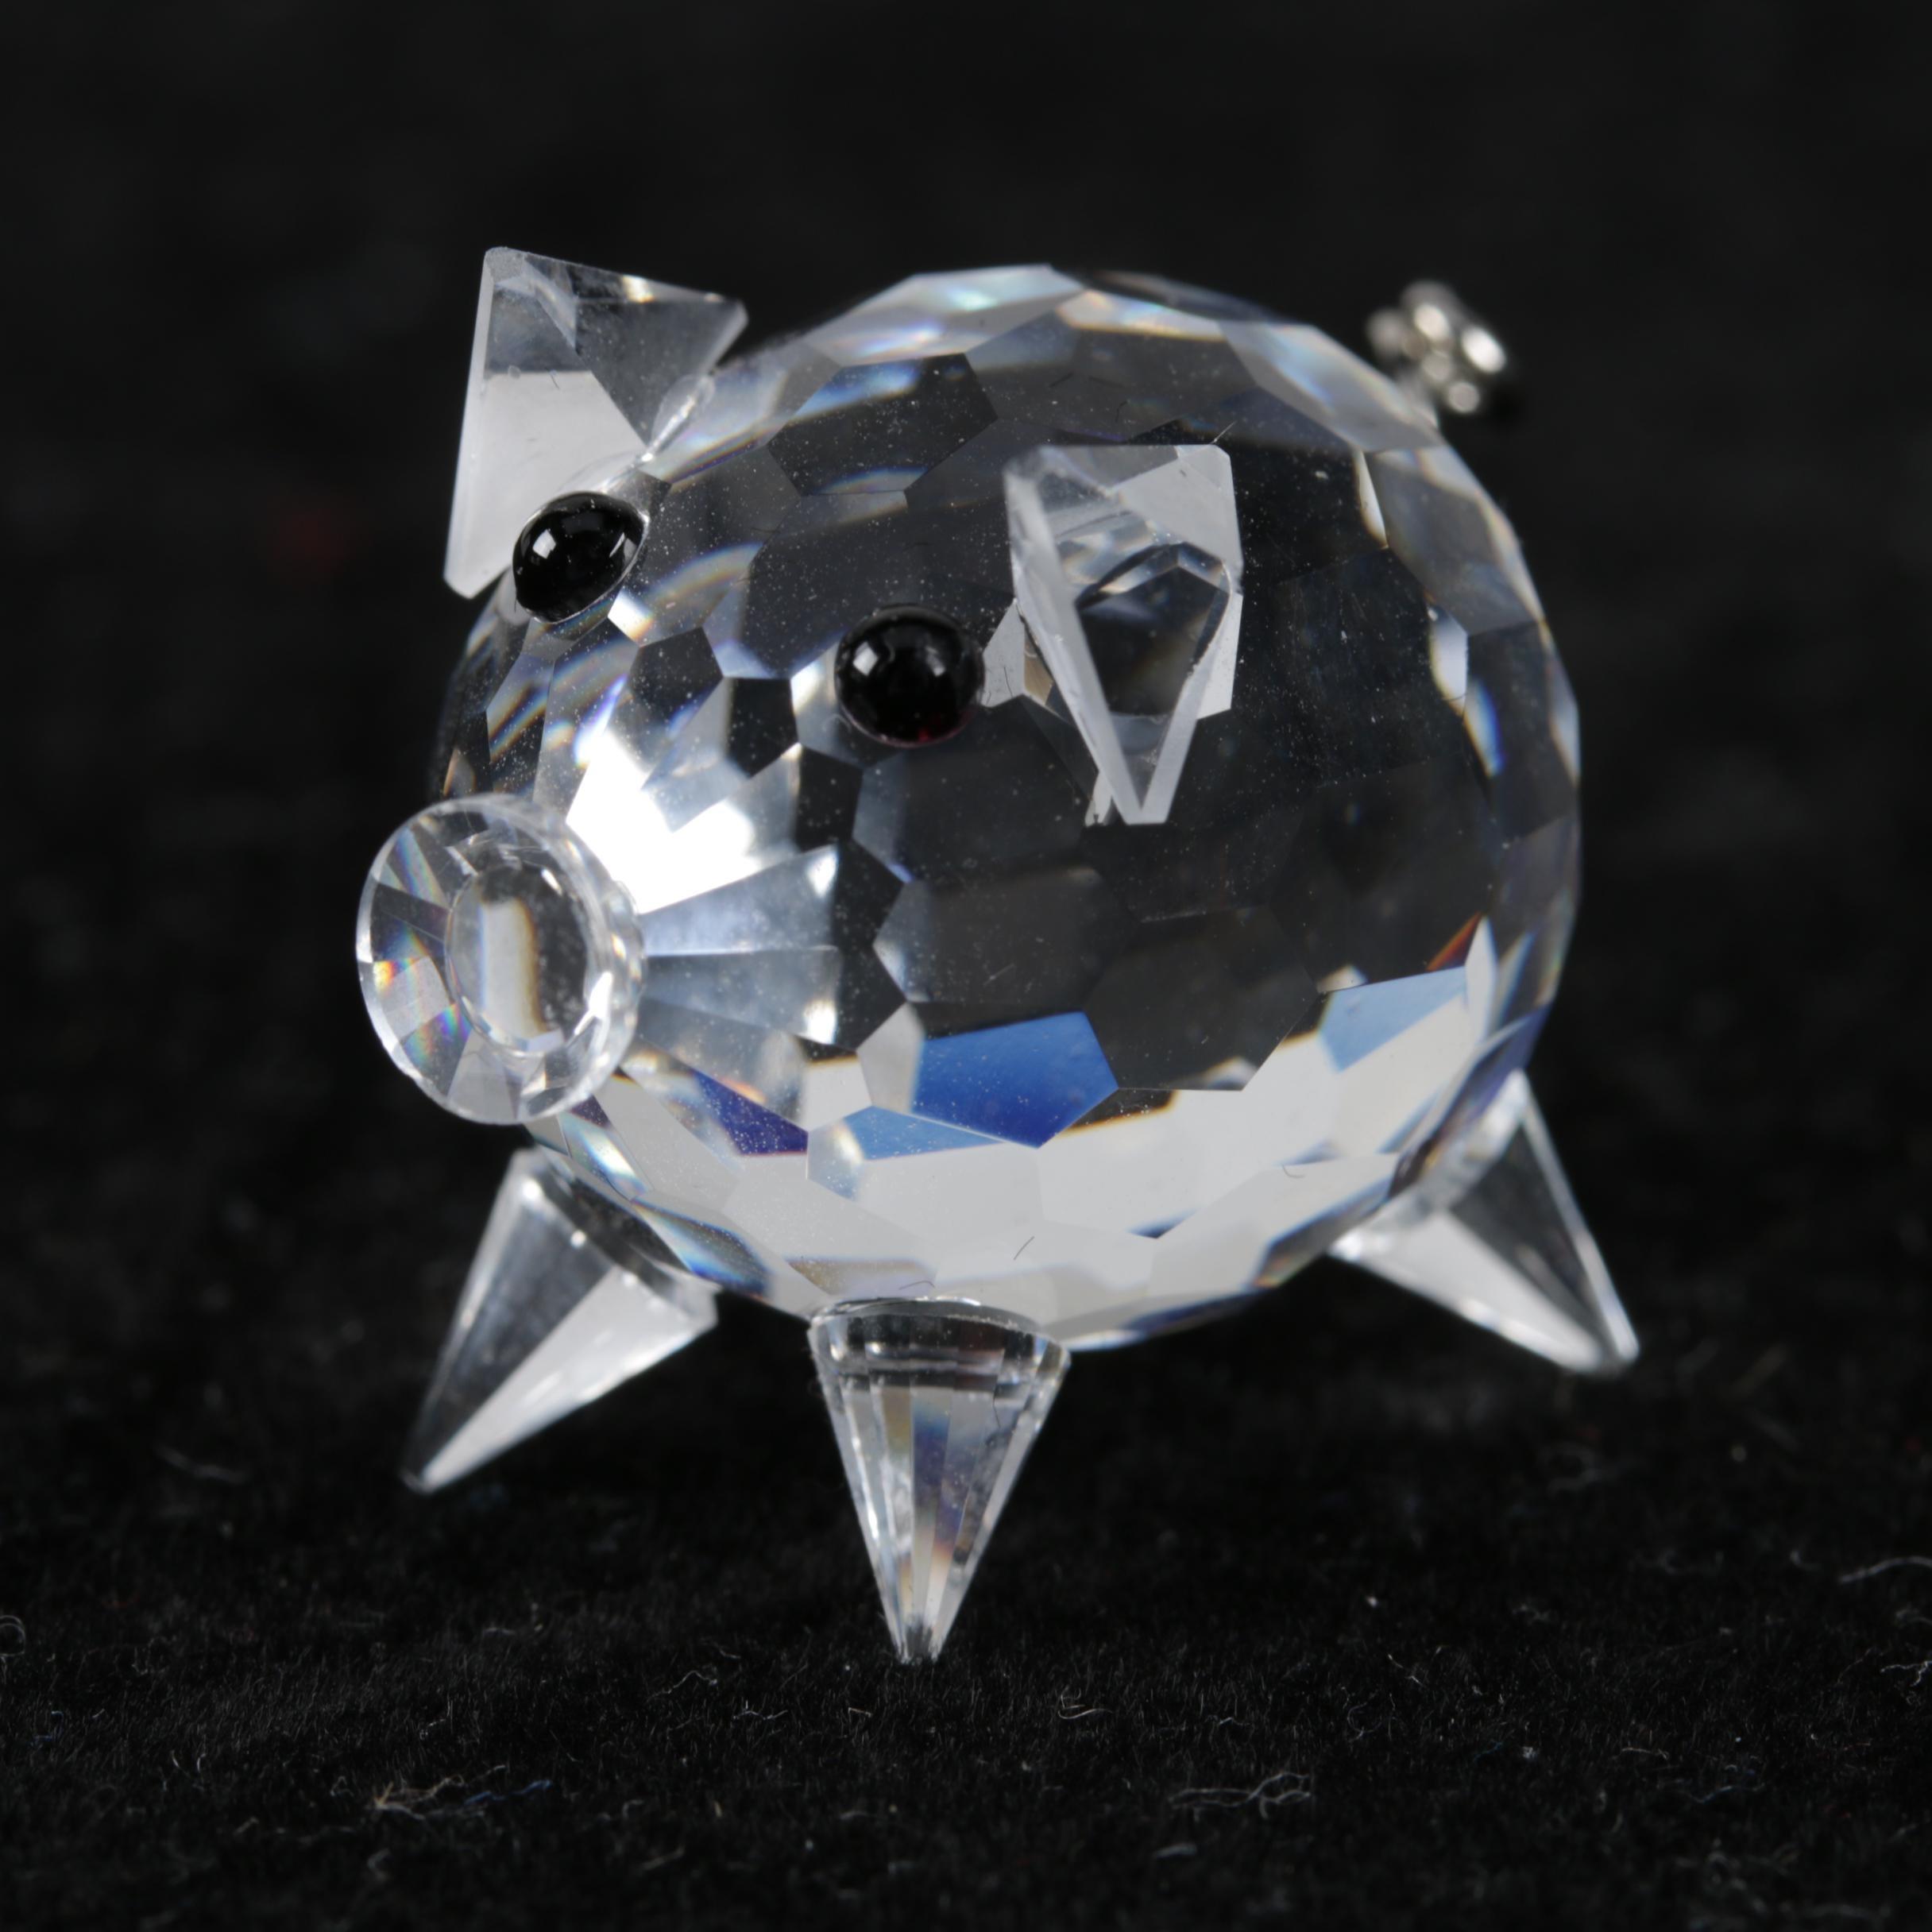 Swarovski Crystal Pig Figurine